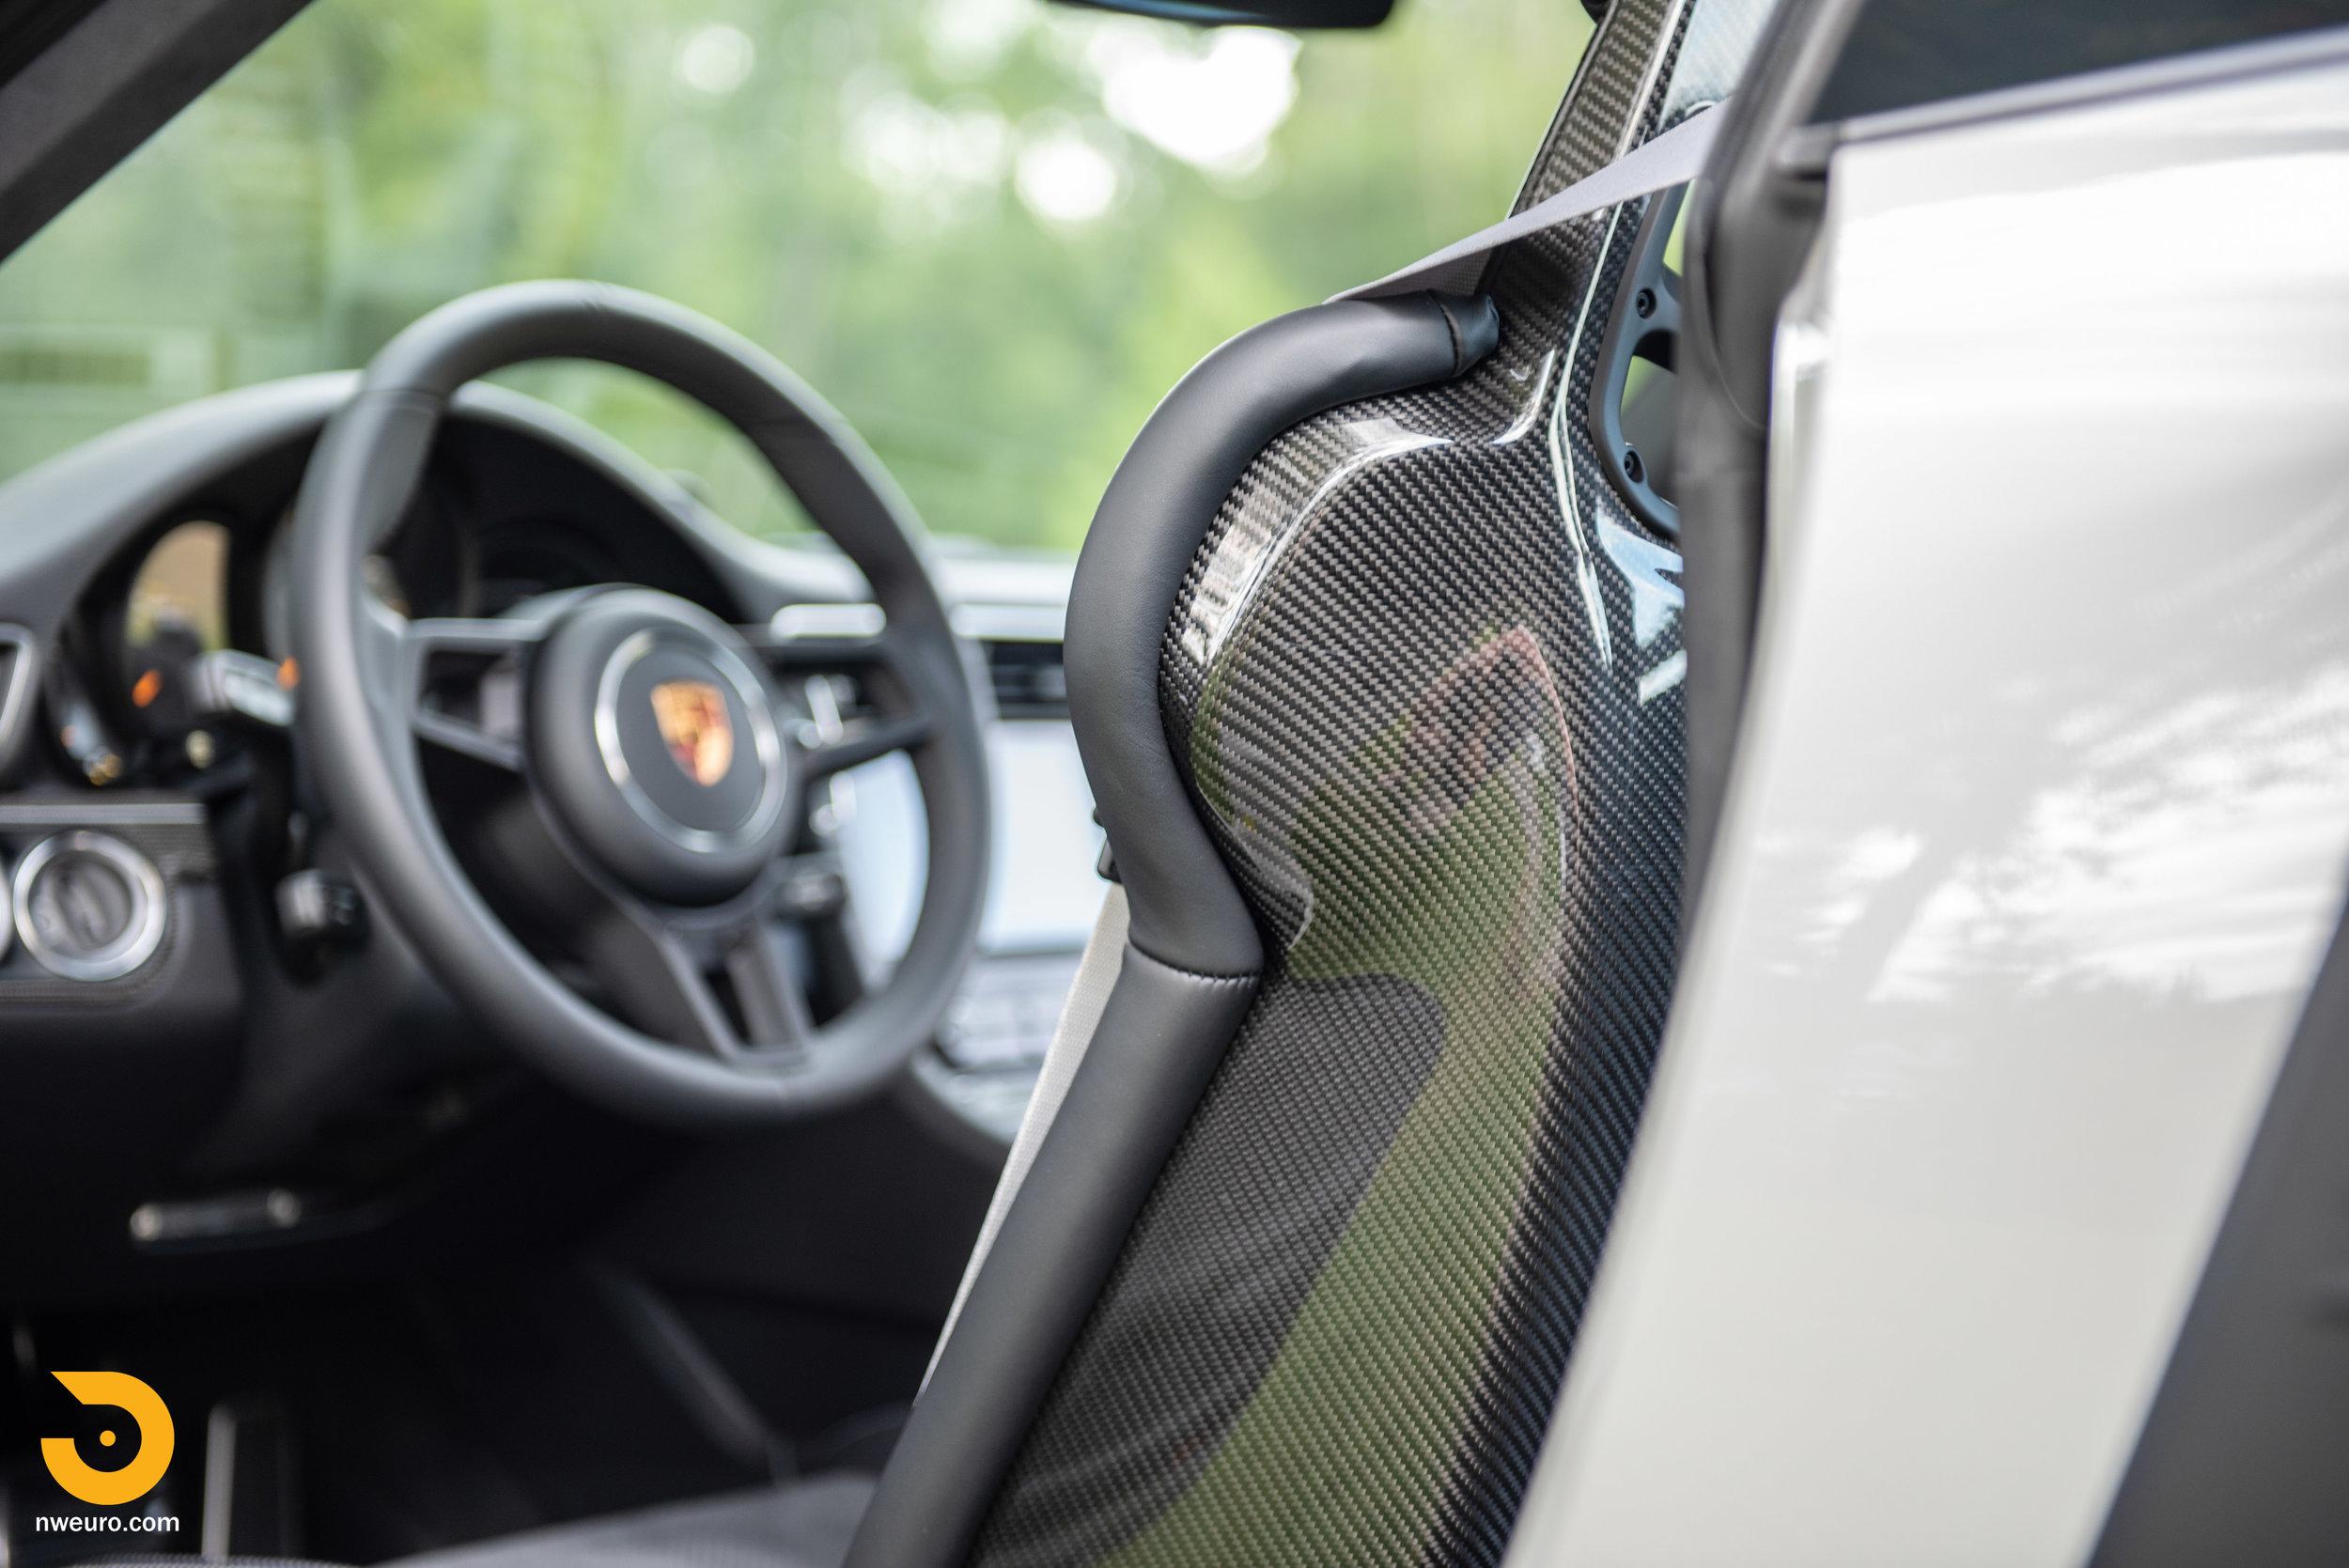 2019 Porsche GT3 RS - Chalk-48.jpg